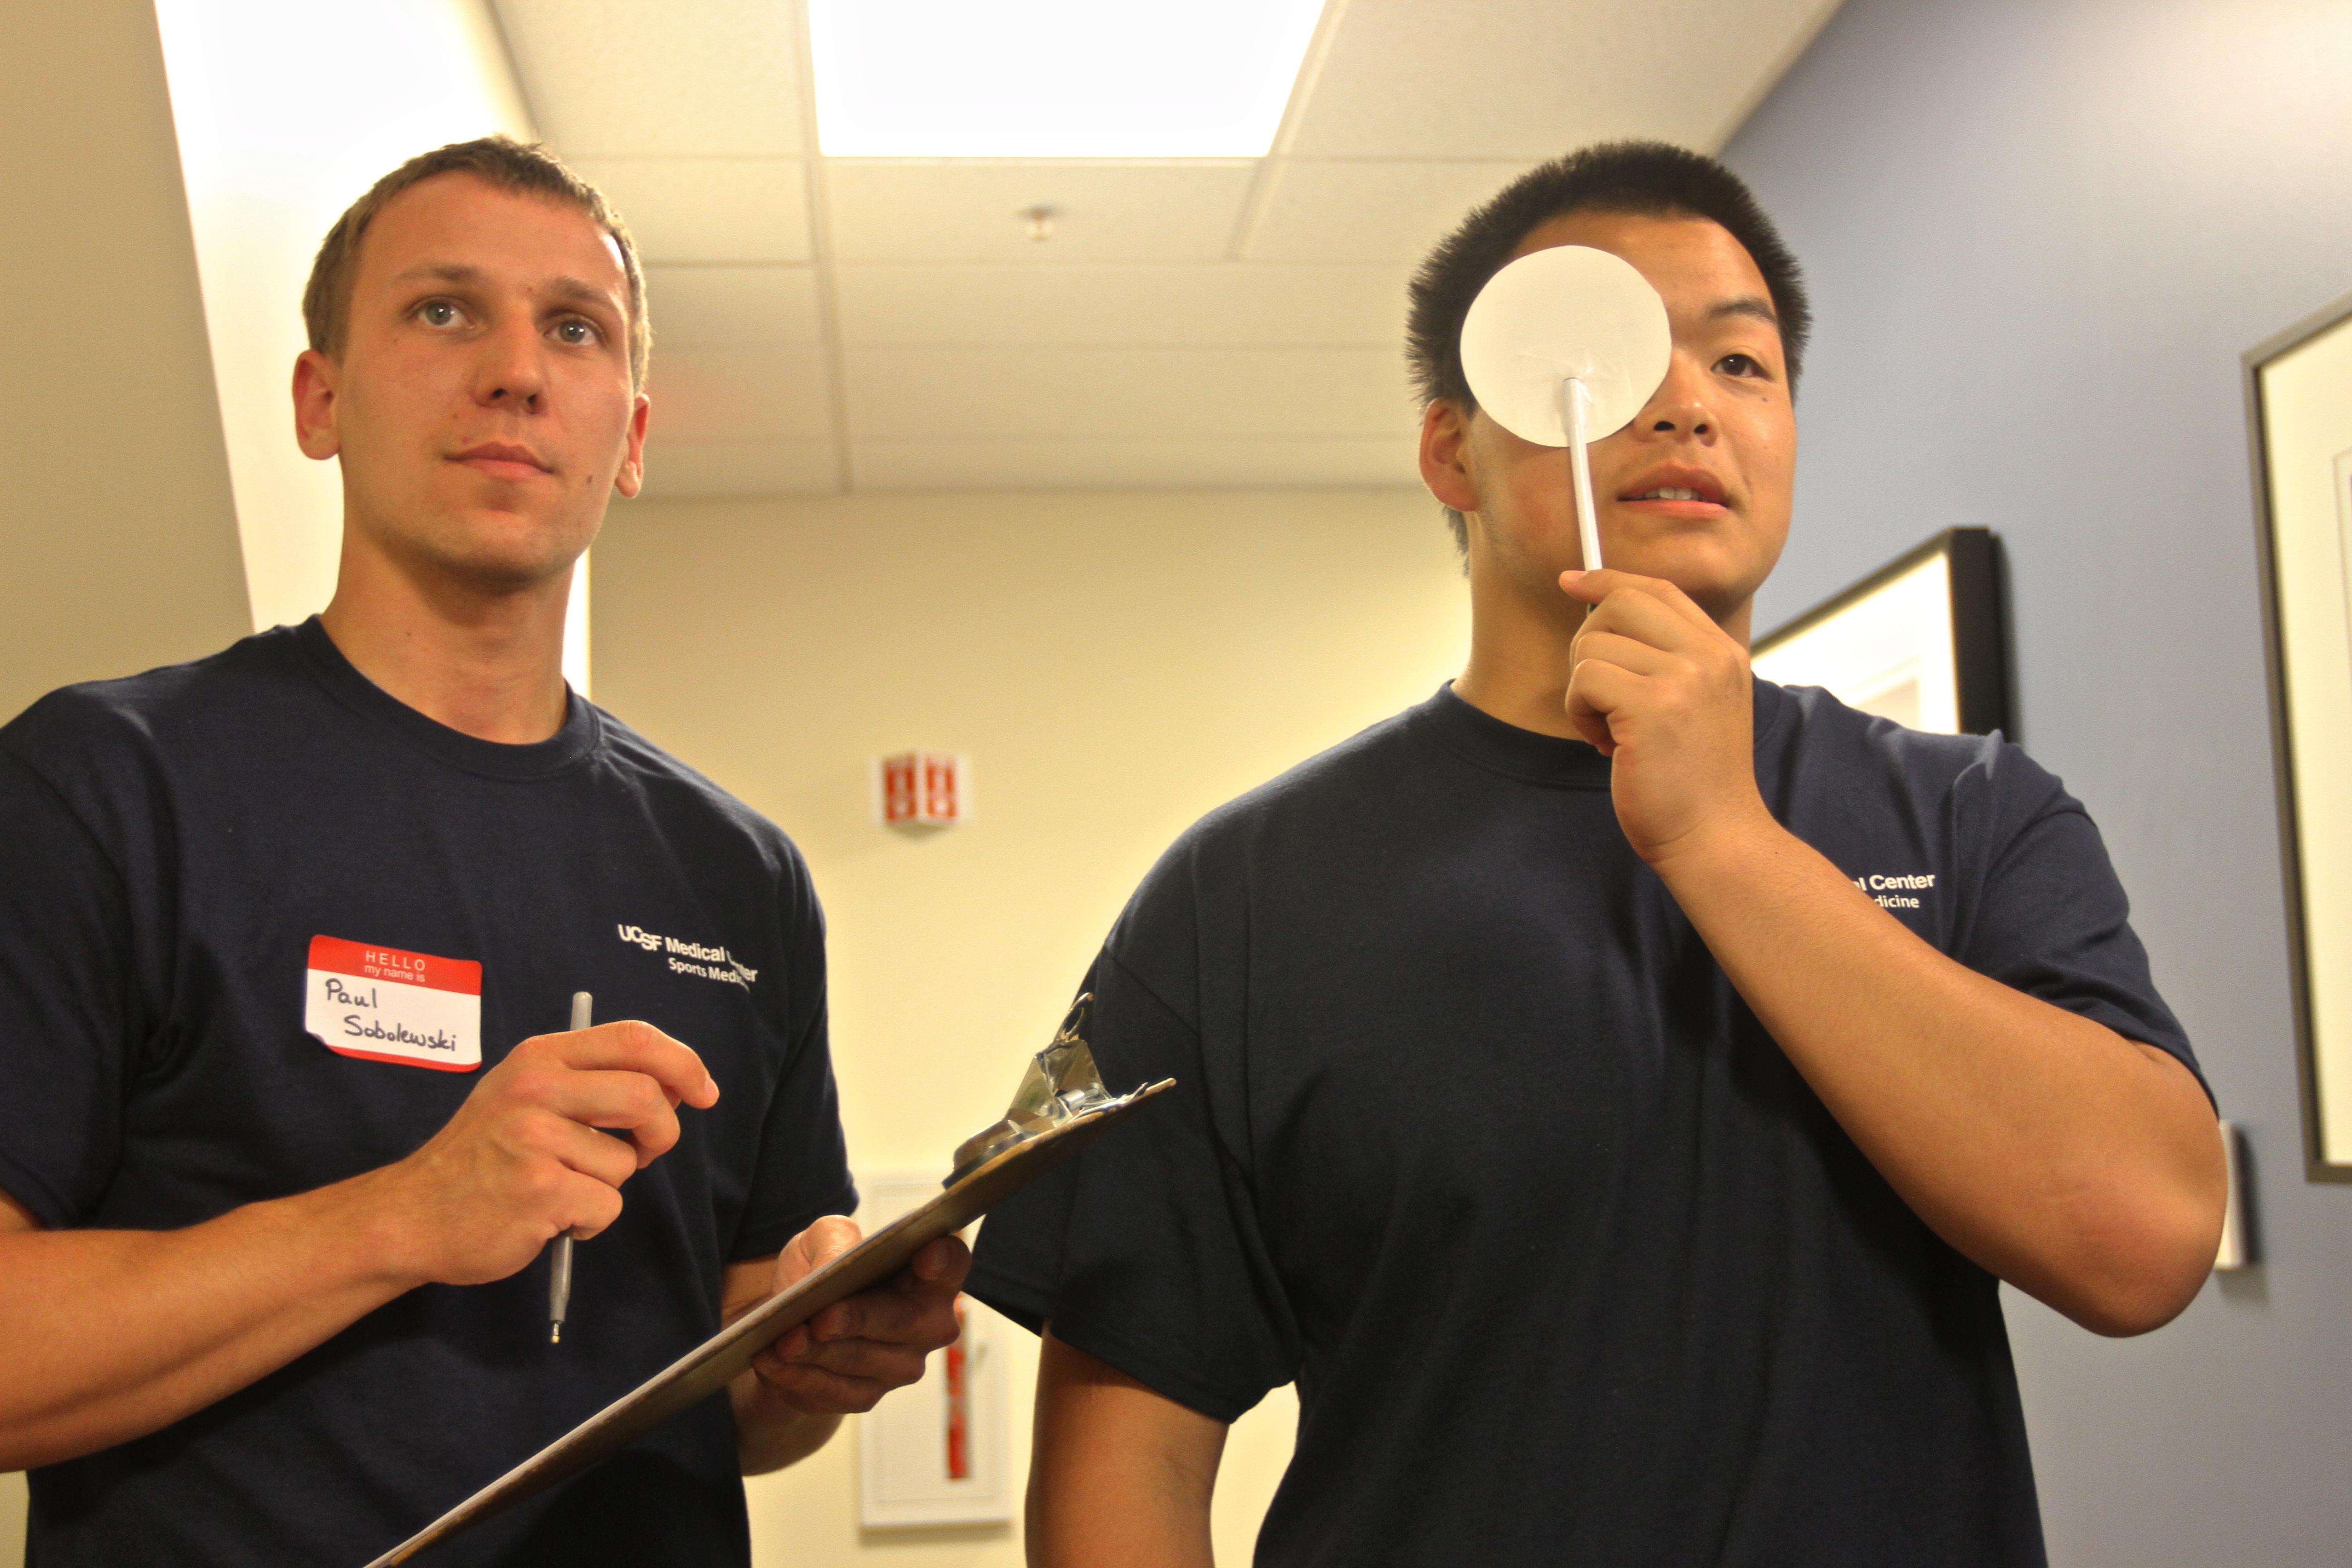 PlaySafe starts with an eye exam.